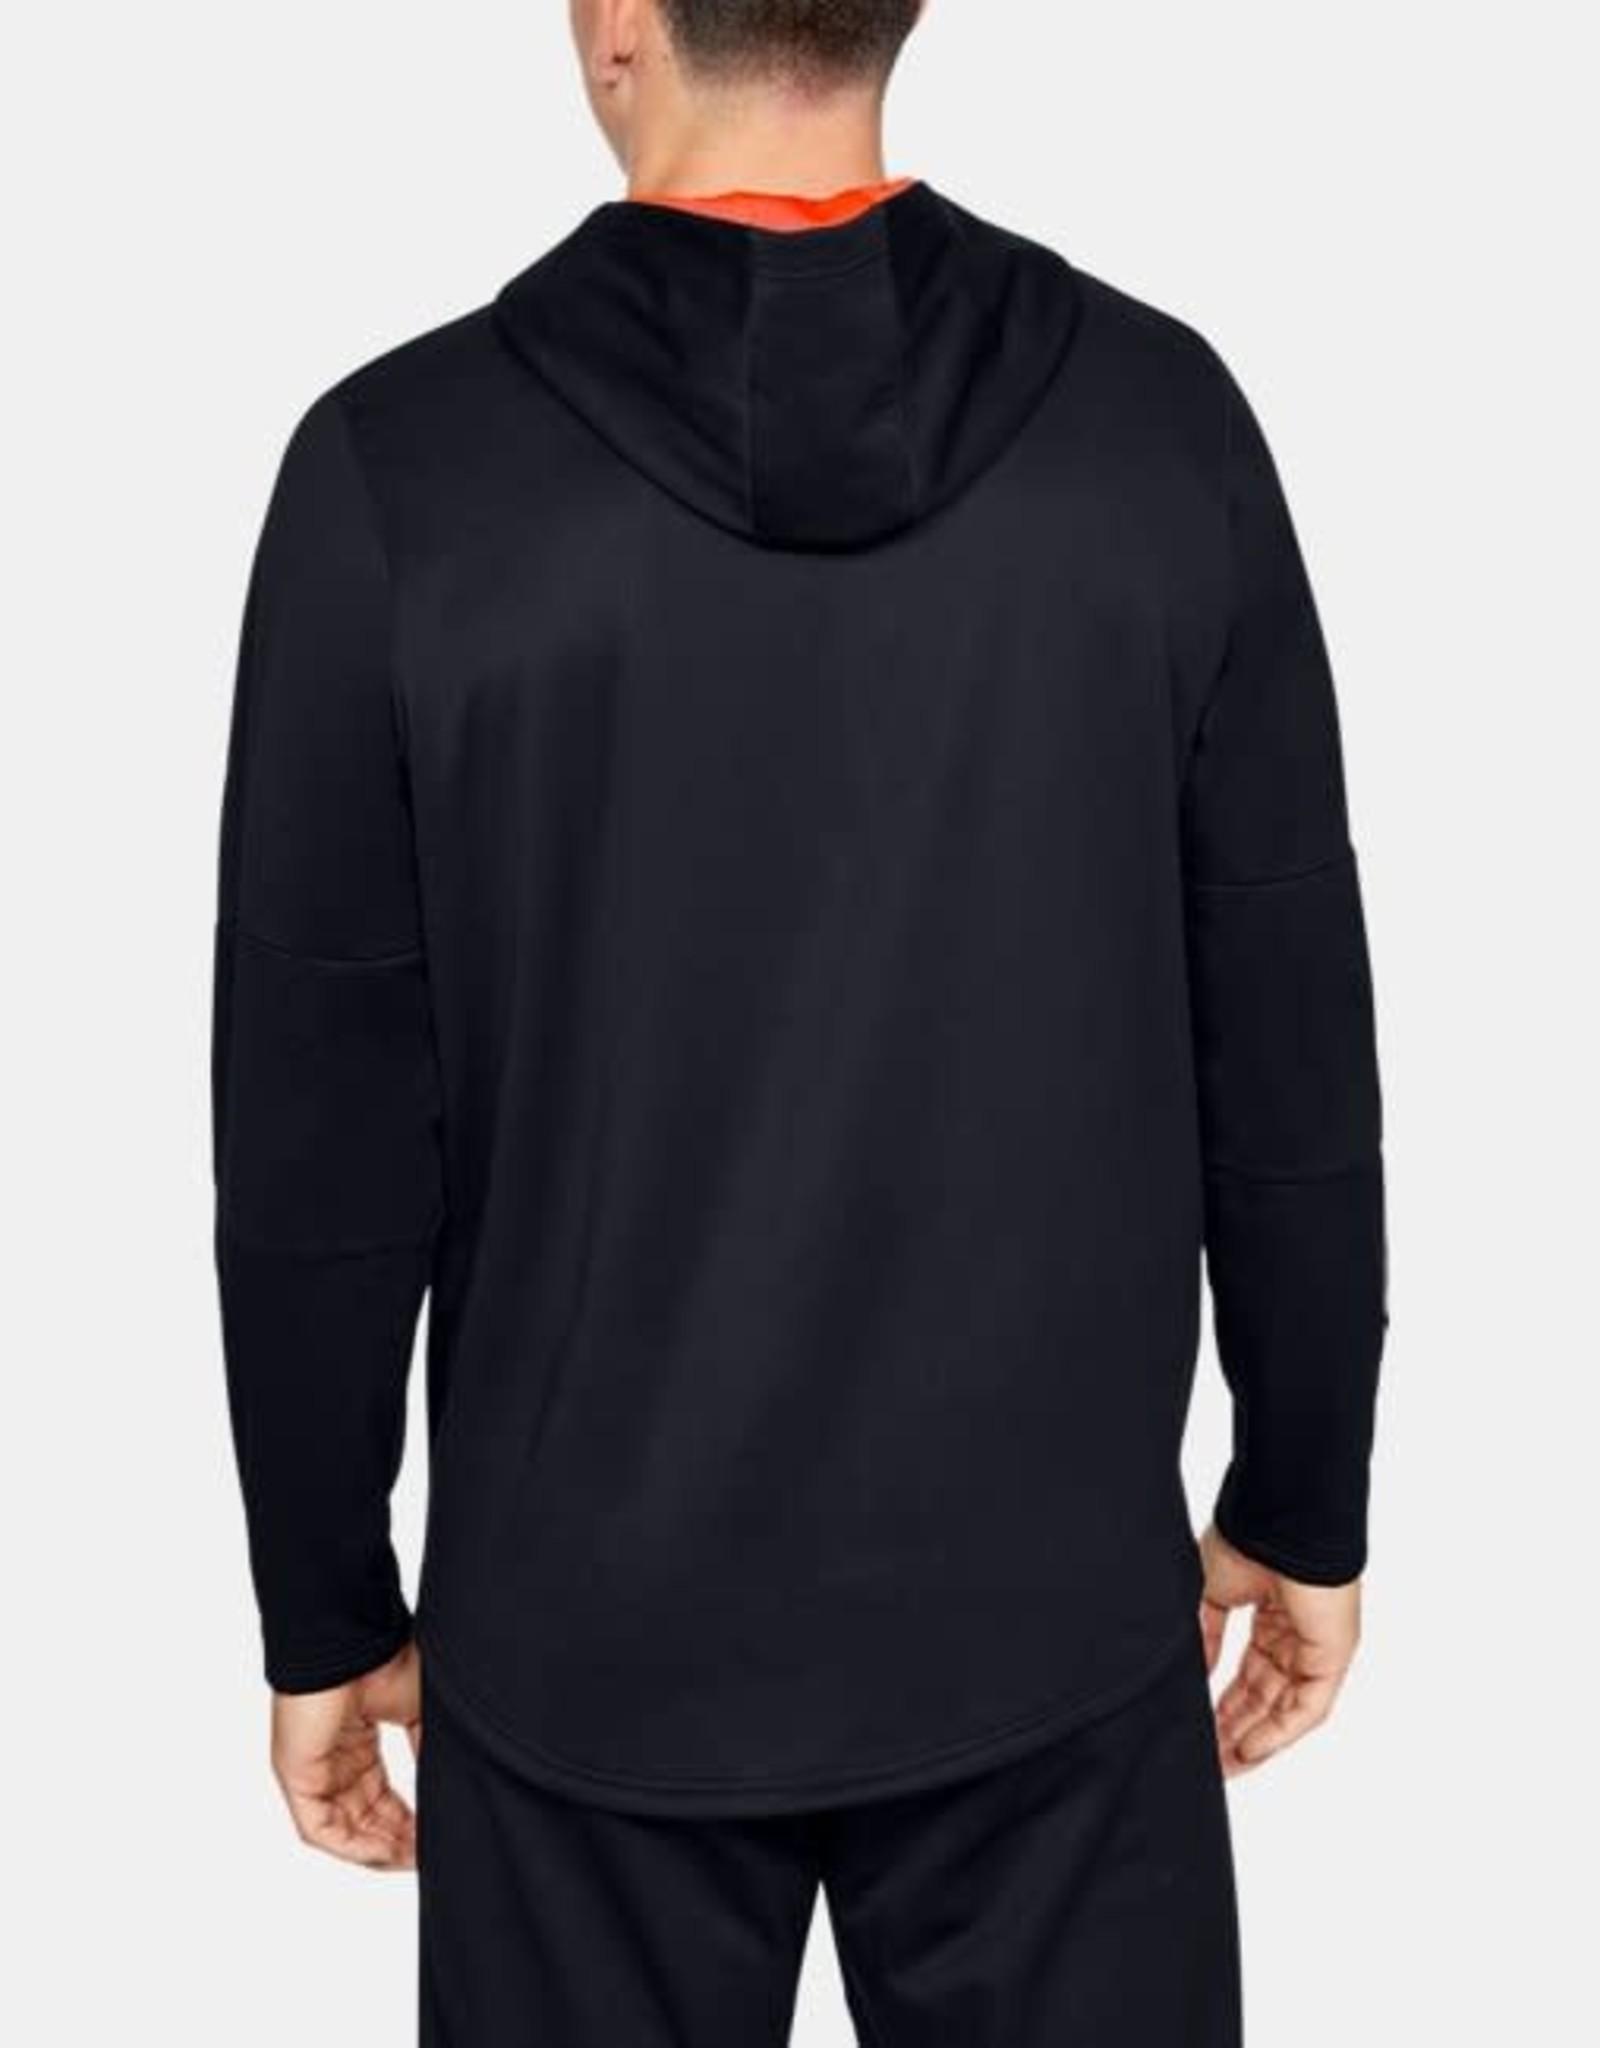 Under Armour ColdGear Fleece Full Zip - black